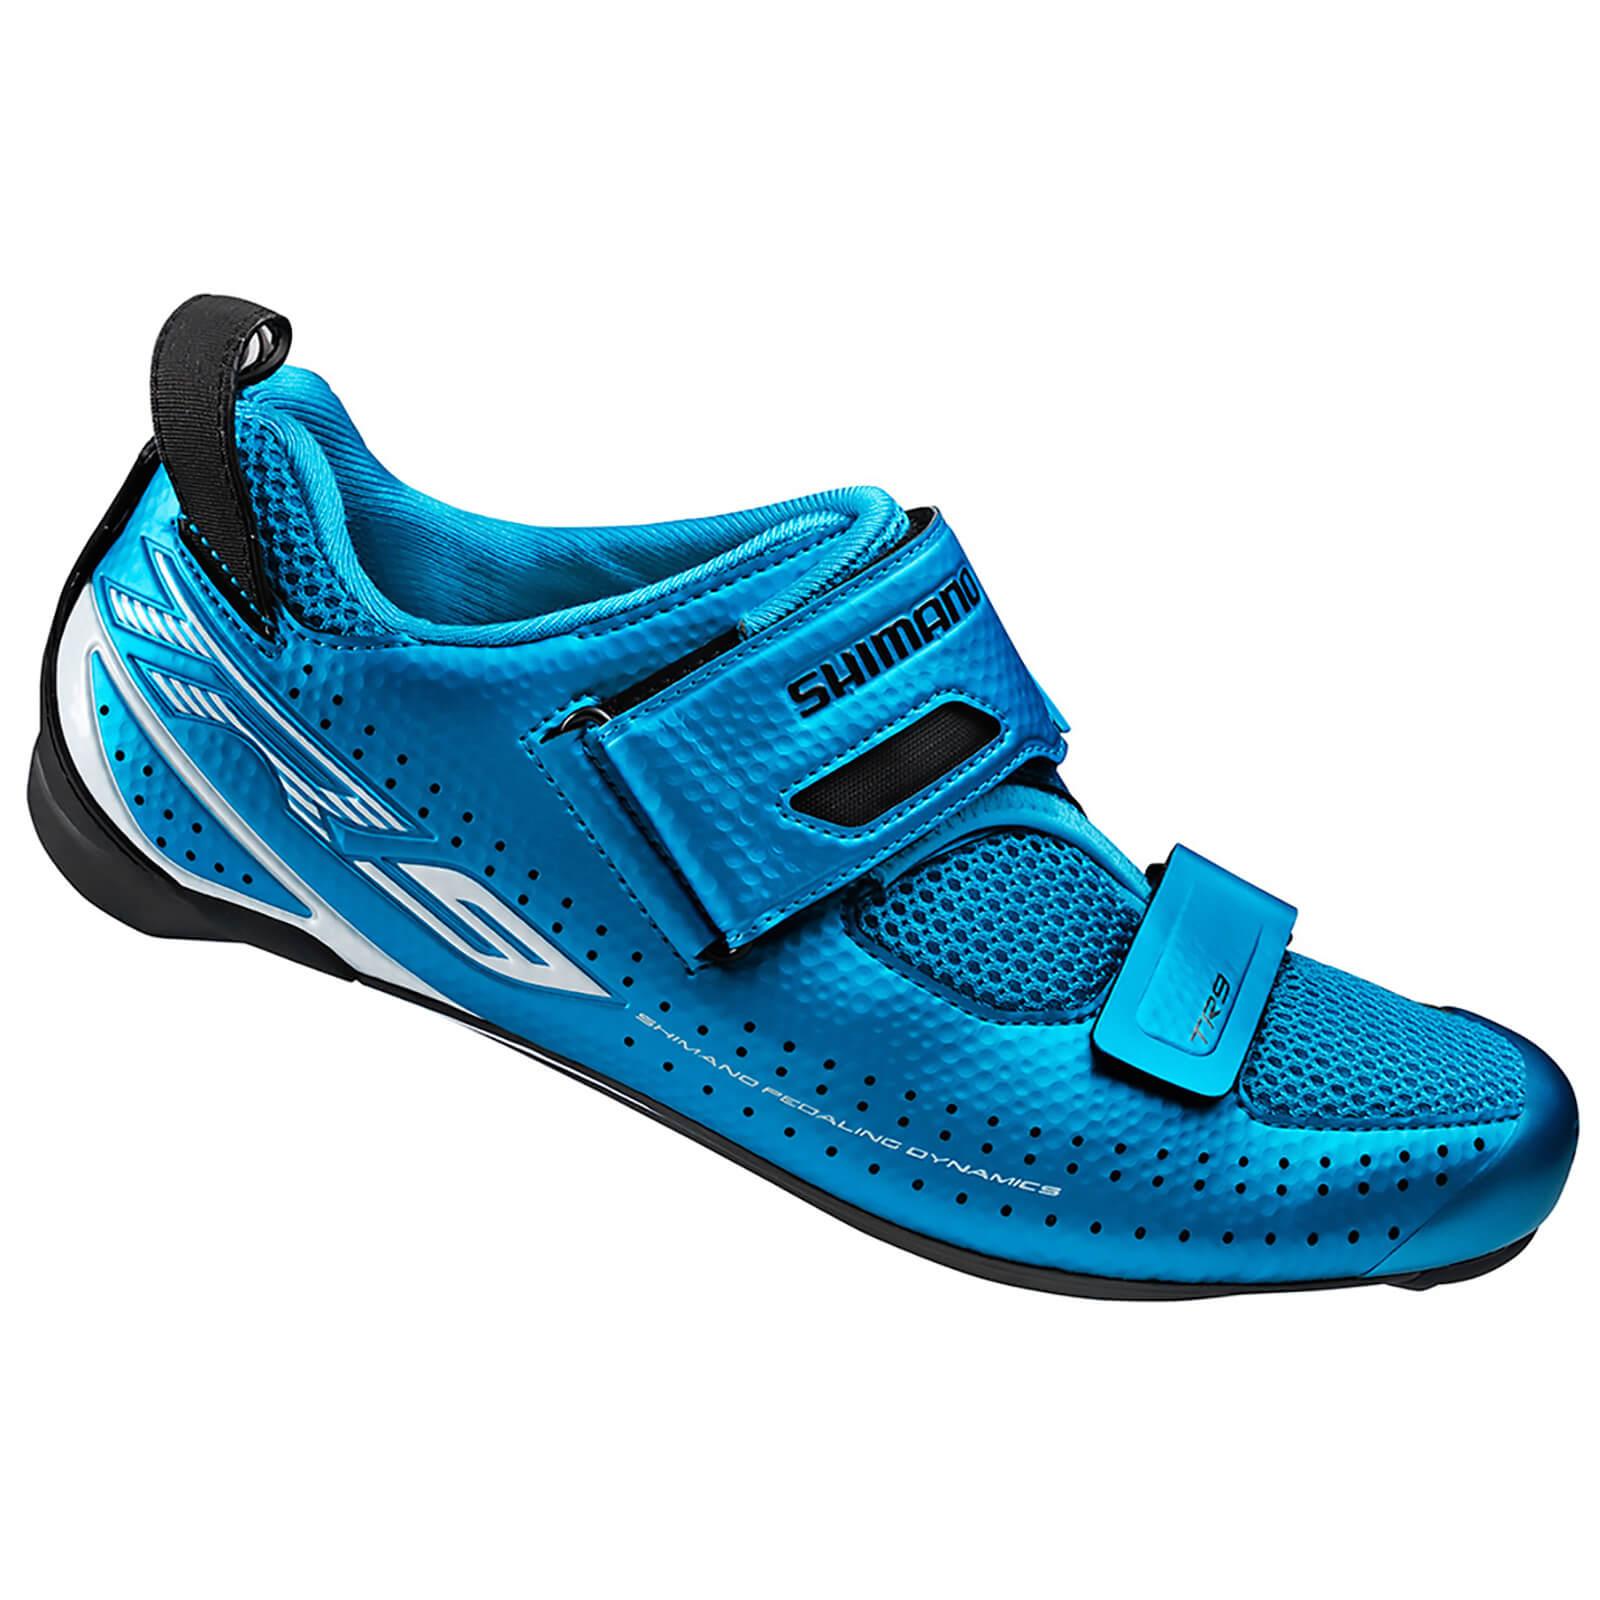 Shimano TR9 SPD-SL Cycling Shoes - Blue - EUR 46 - Blue